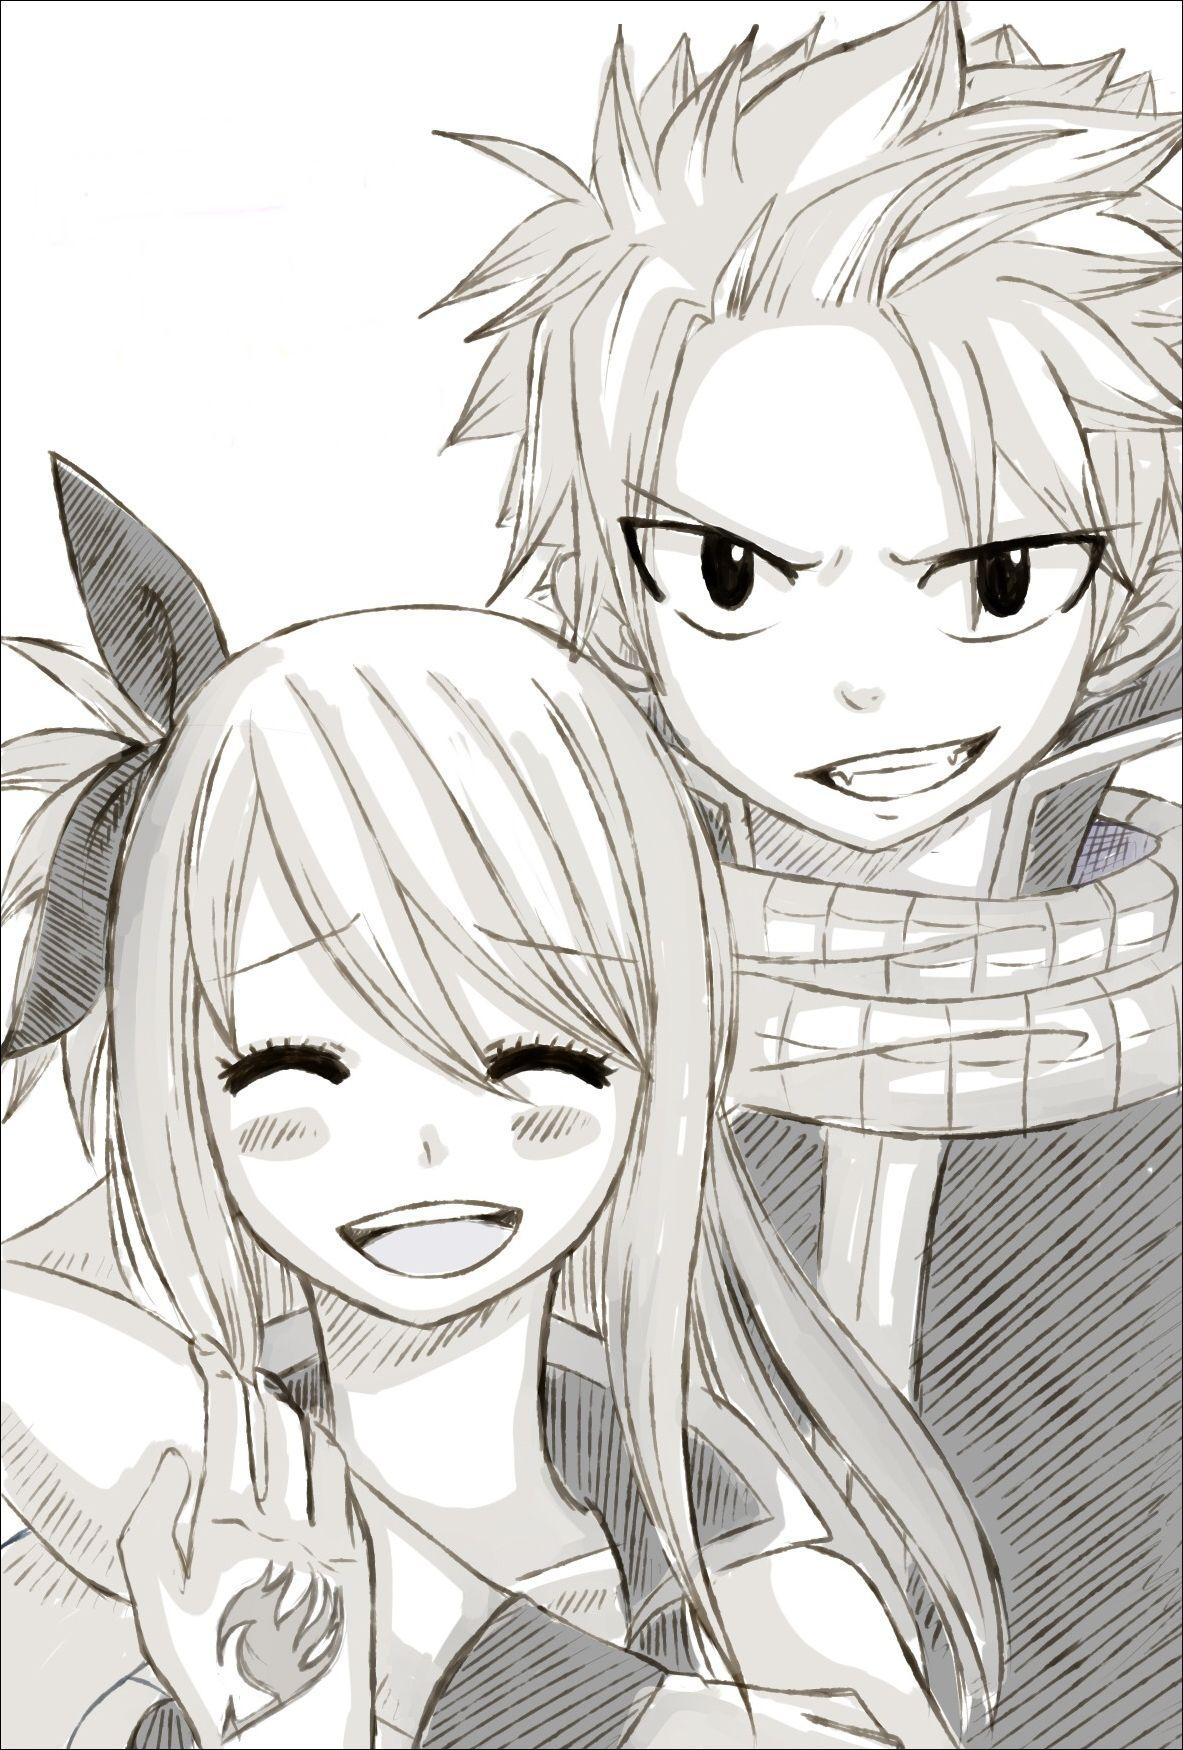 Natsu Dragneel X Lucy Heartfilia Nalu Fairy Tail Fairy Tail Art Fairy Tail Photos Fairy Tail Drawing